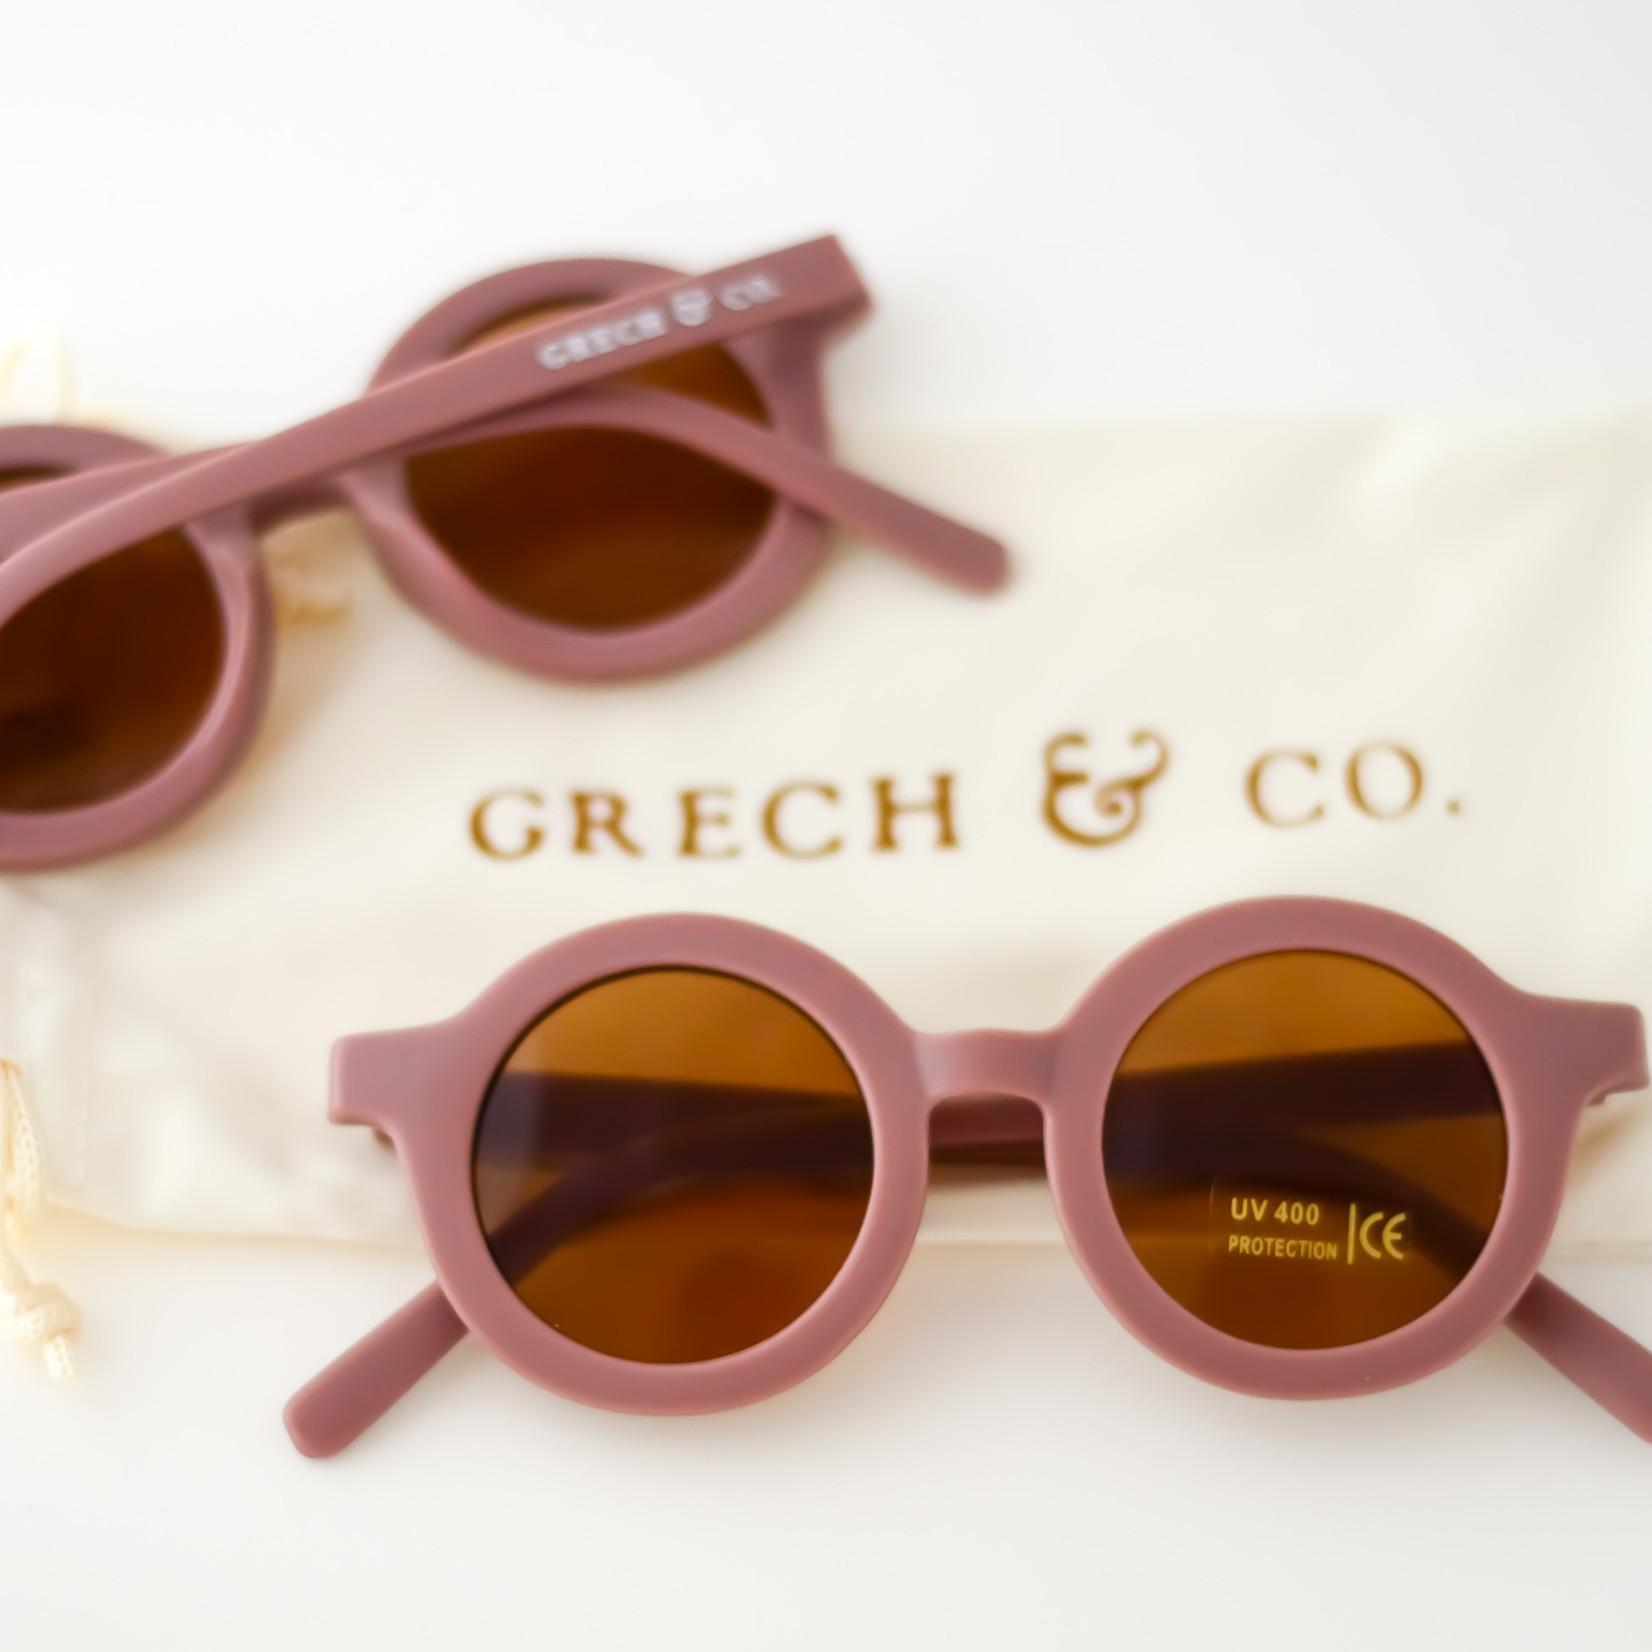 Grech & Co Grech & Co | Zonnebril - Burlwood